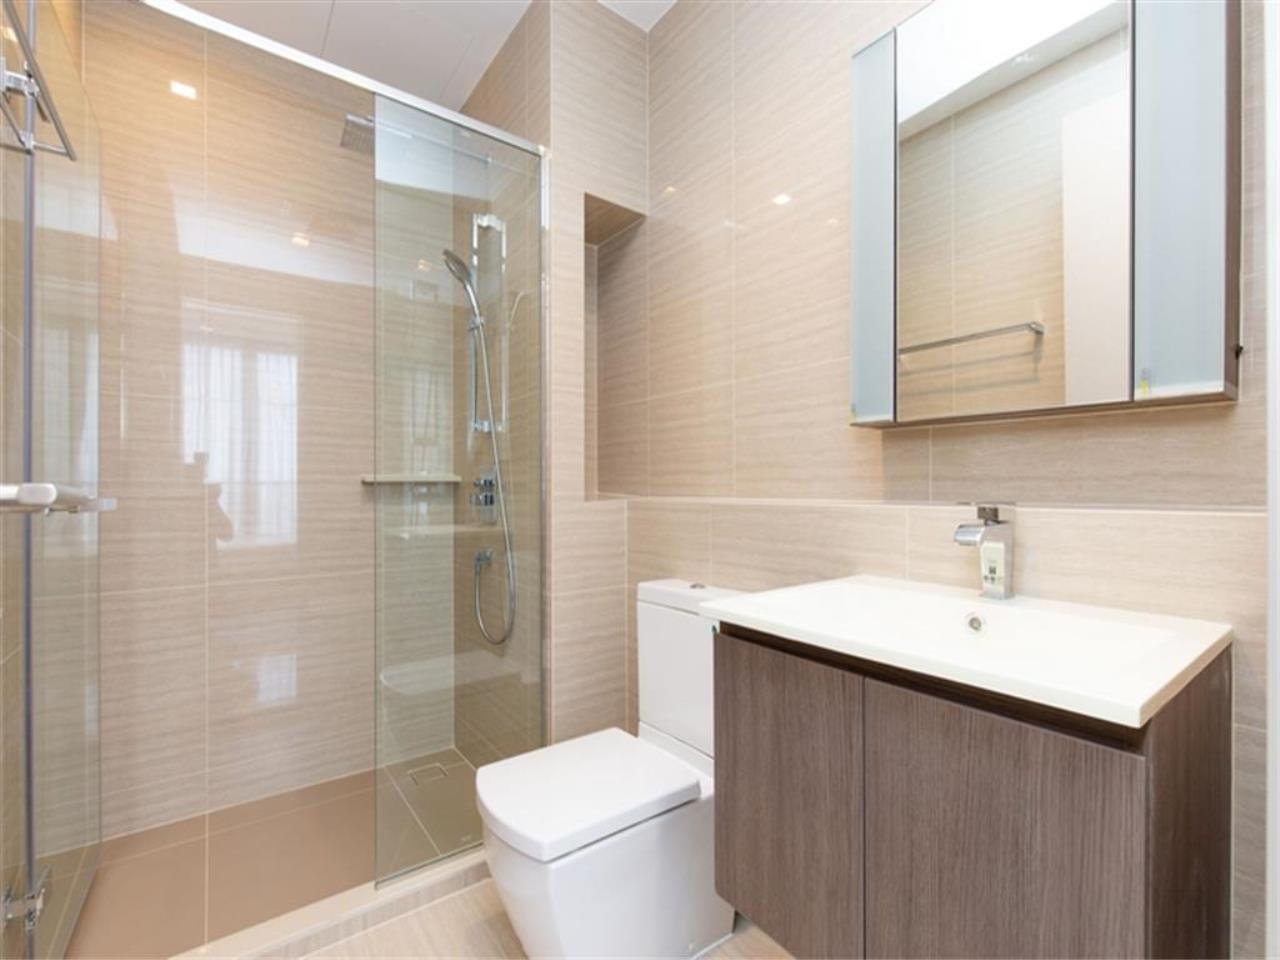 Plus Property Agency's Rent : CD190239 THE LINE ASOKE-RATCHADA Condominium New Petchburi - Rama 9 Bangkok 1